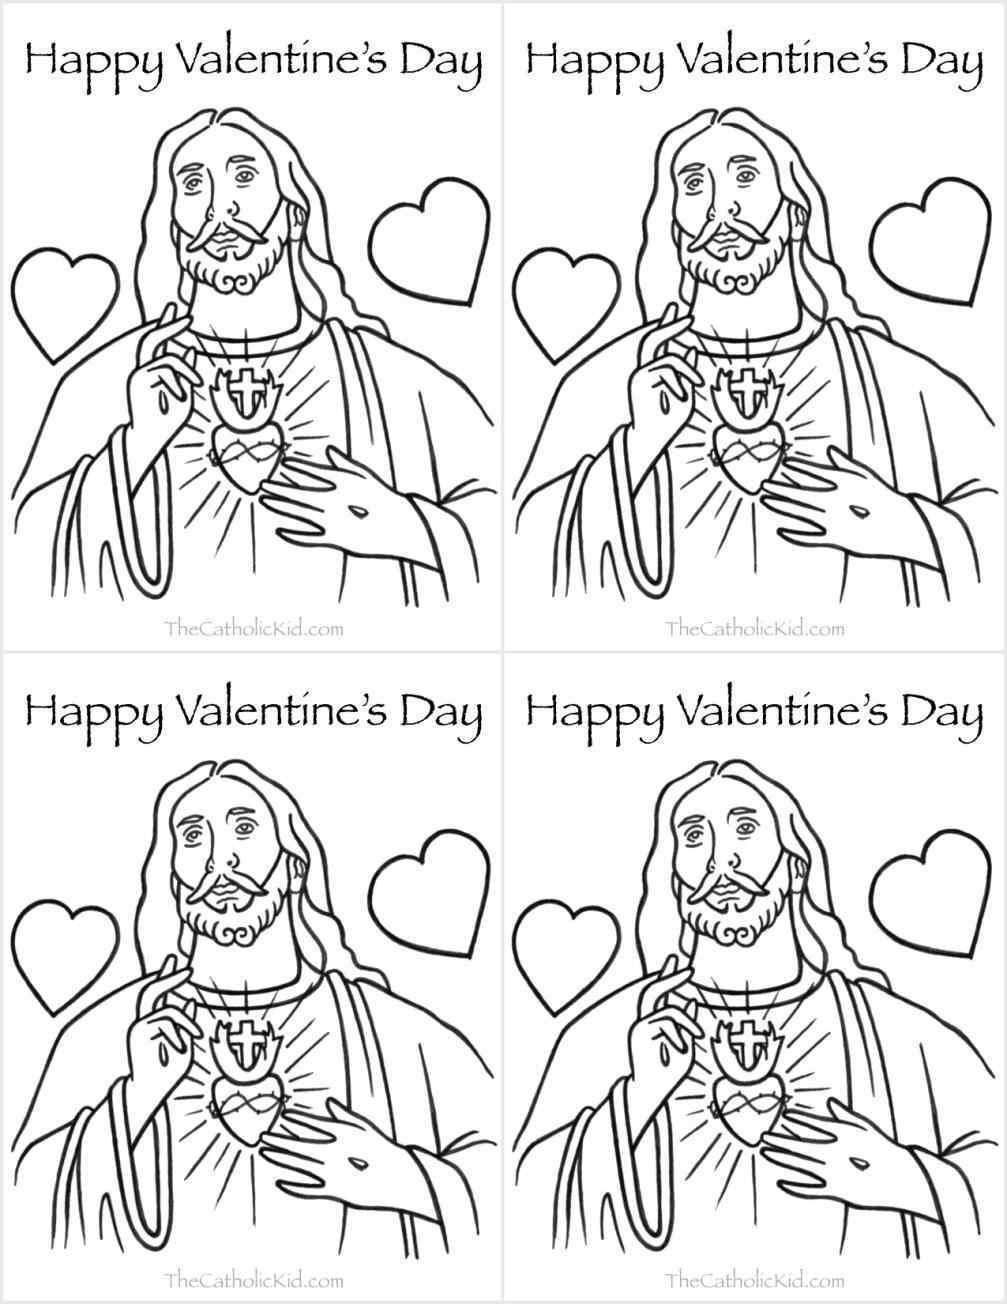 1007x1304 Pages Valentines Day Printable Image Saint Valentine Page St Saint